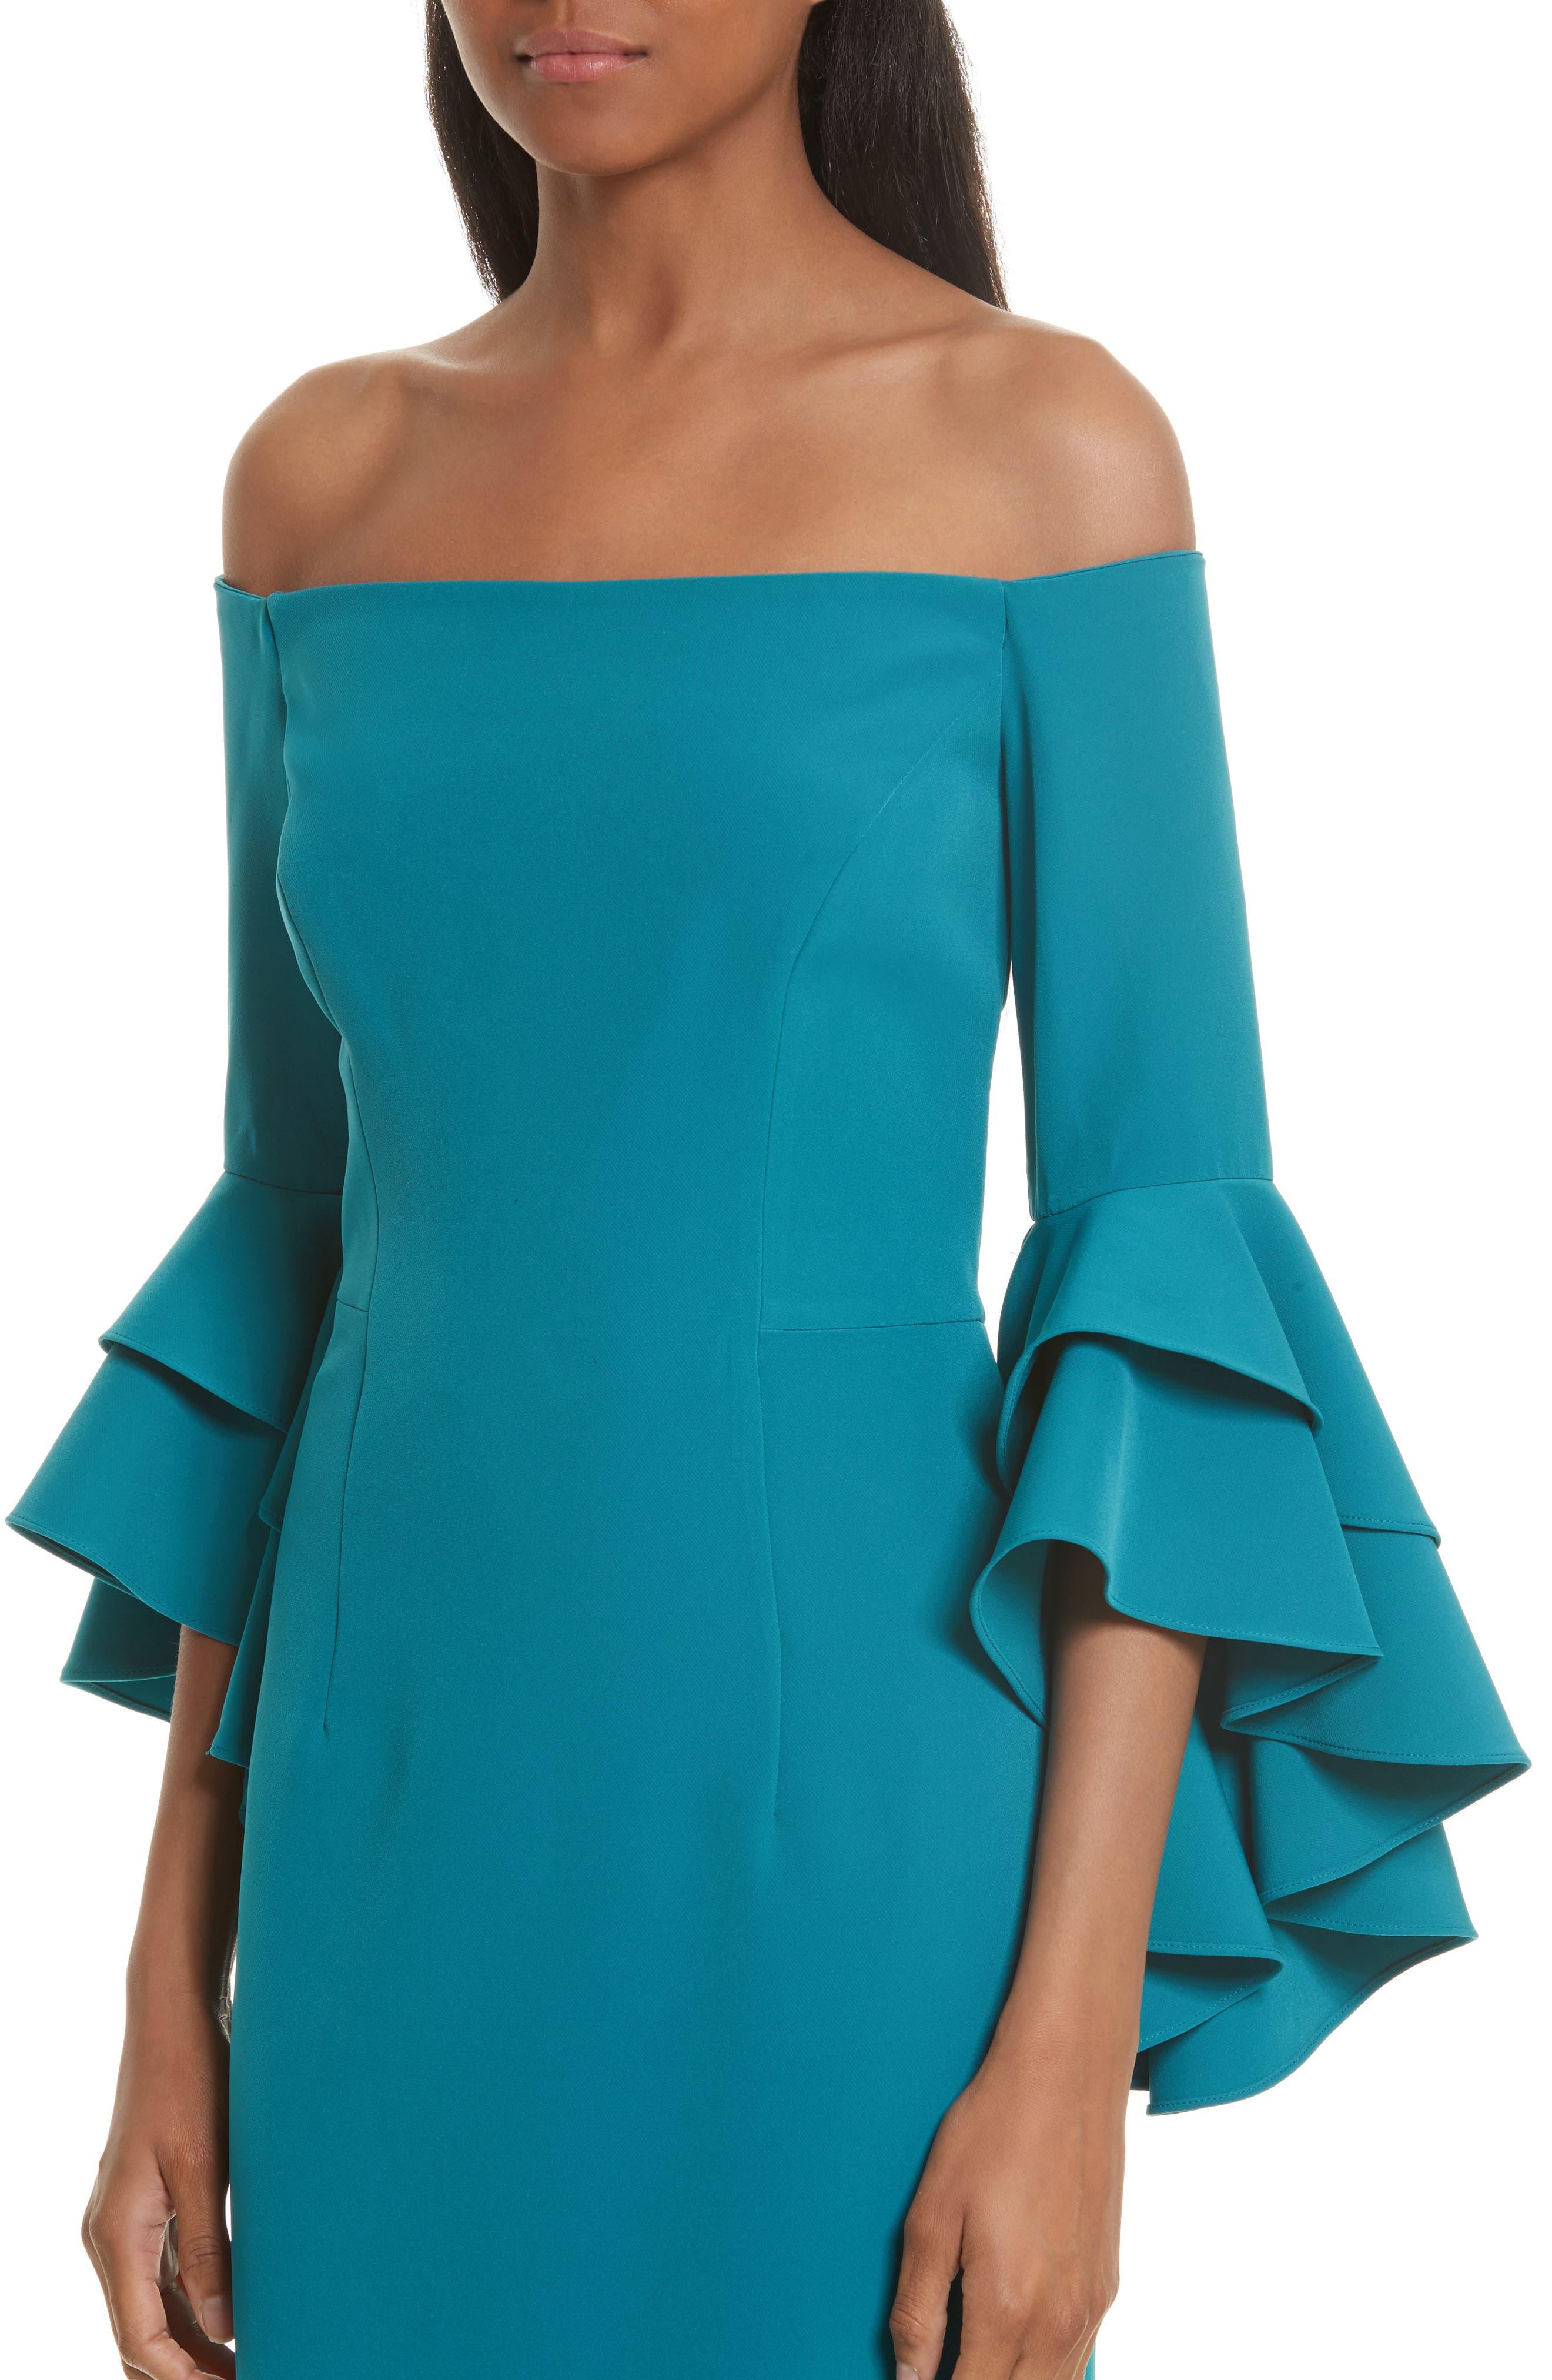 MILLY, Selena Off the Shoulder Midi Dress, Alternate thumbnail 4, color, 442